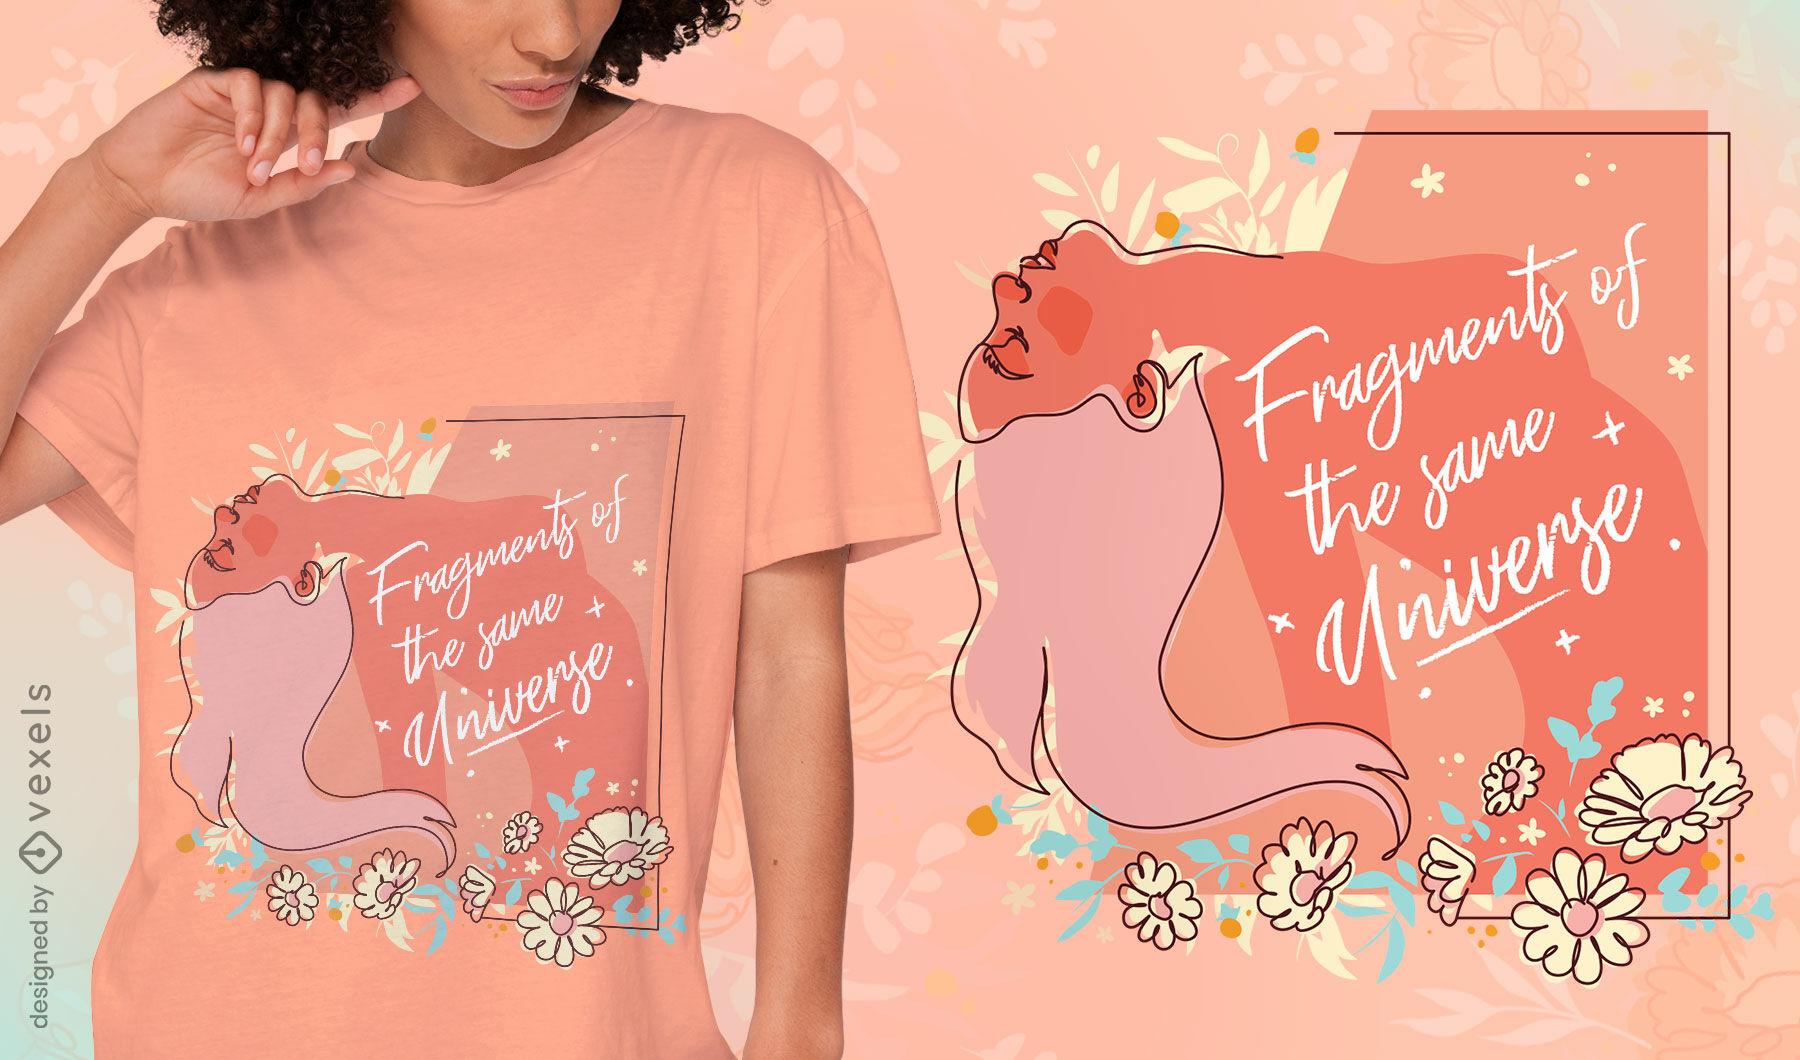 Diseño de camiseta de salud mental de girl universe